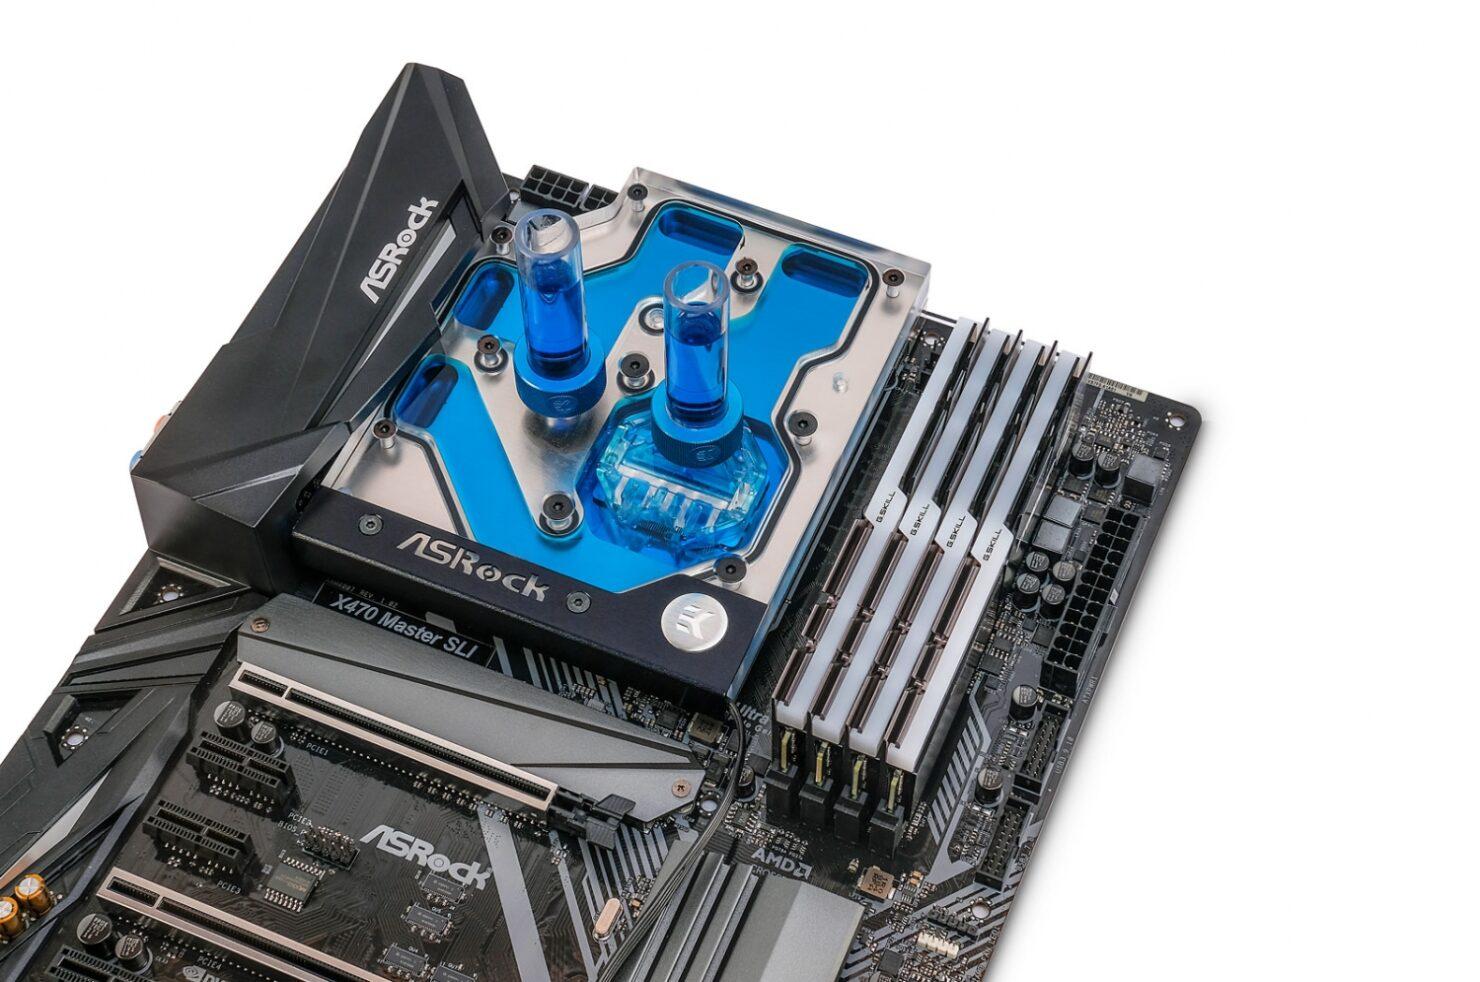 p-0144_ek_fb-asrock-x470-gaming-k4-rgb-monoblock_nicekl_mbrgb_blue_as-1500x995